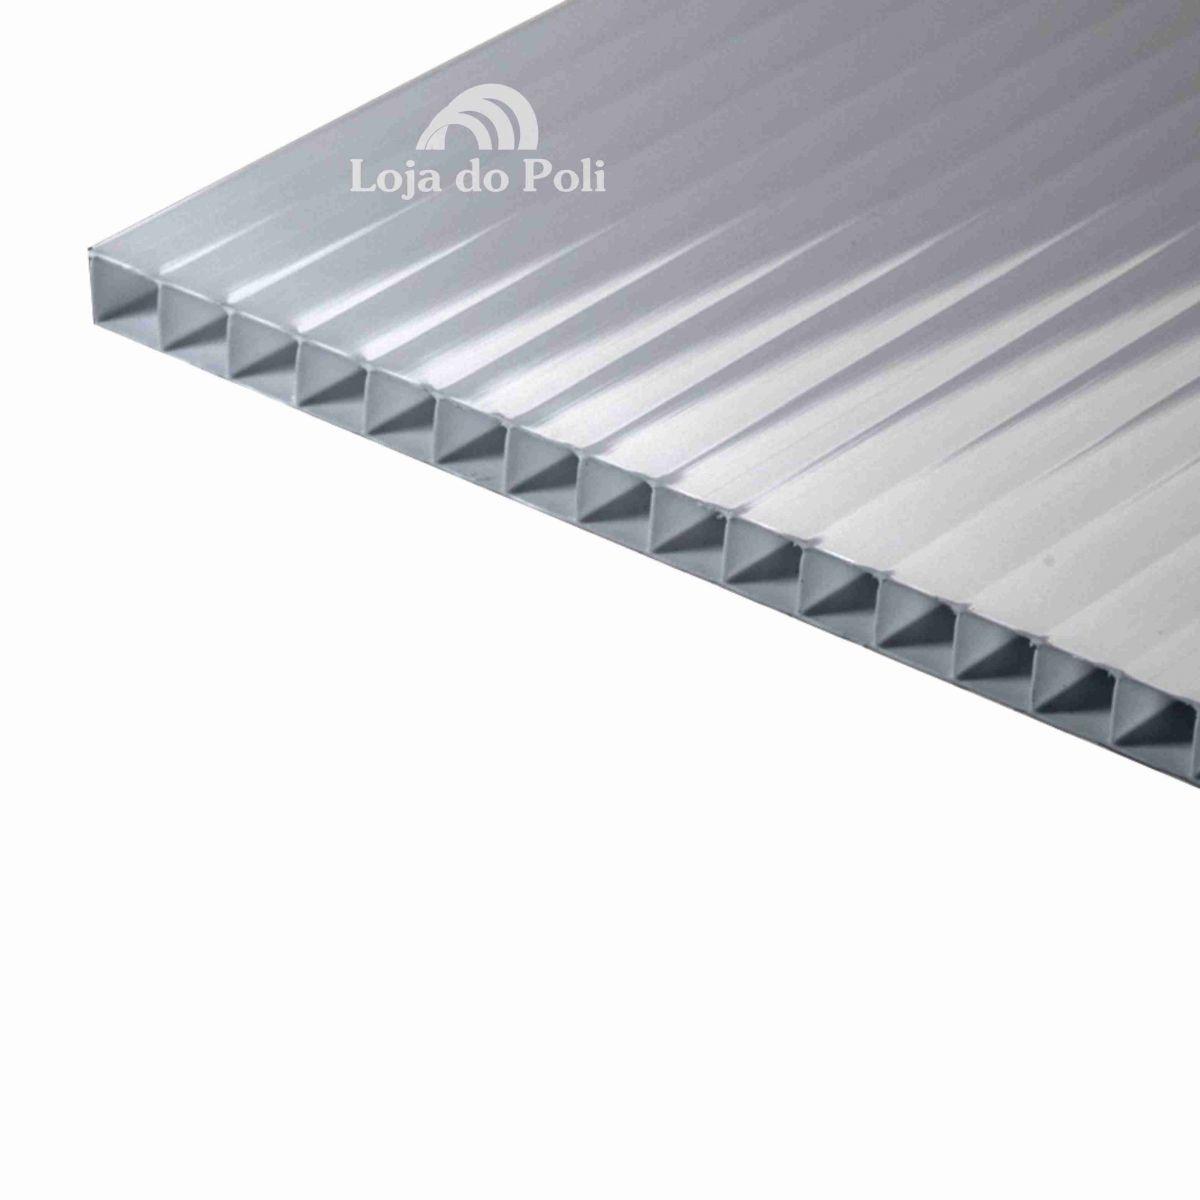 Chapa Policarbonato Alveolar Prata Solar Reflective 6mm 2,1x6,0m